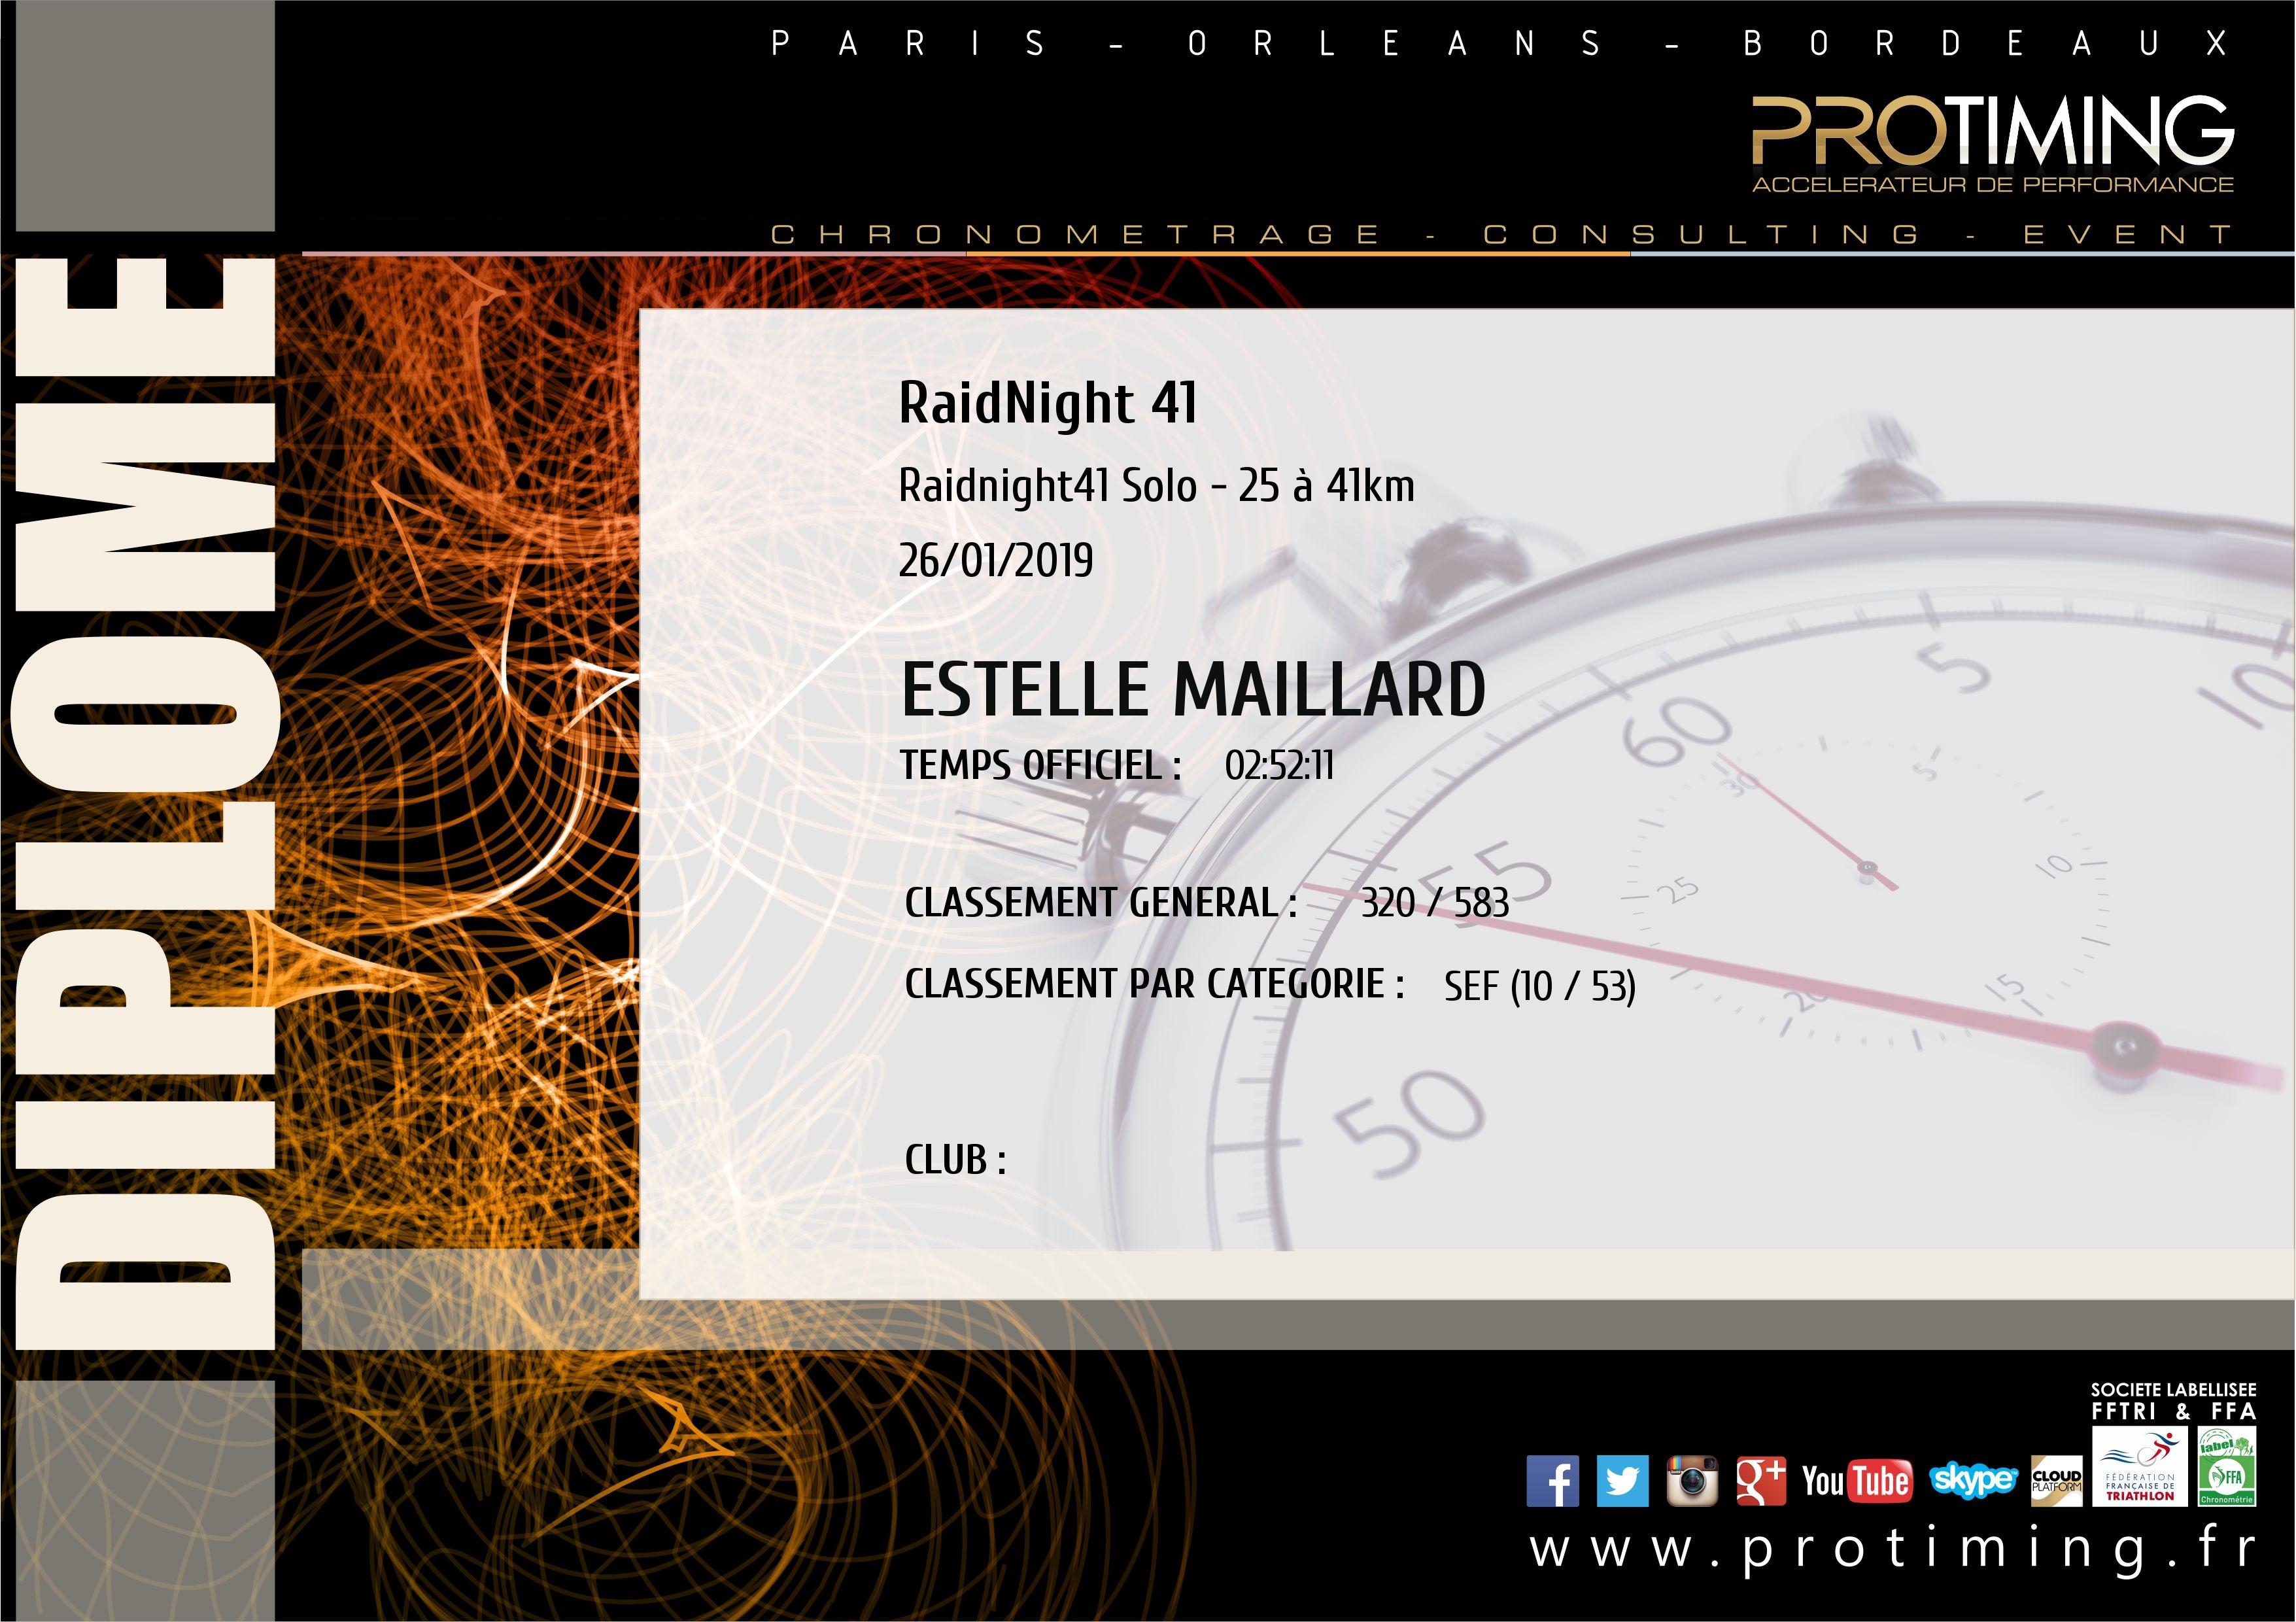 Résultats : RaidNight 41 ProTiming